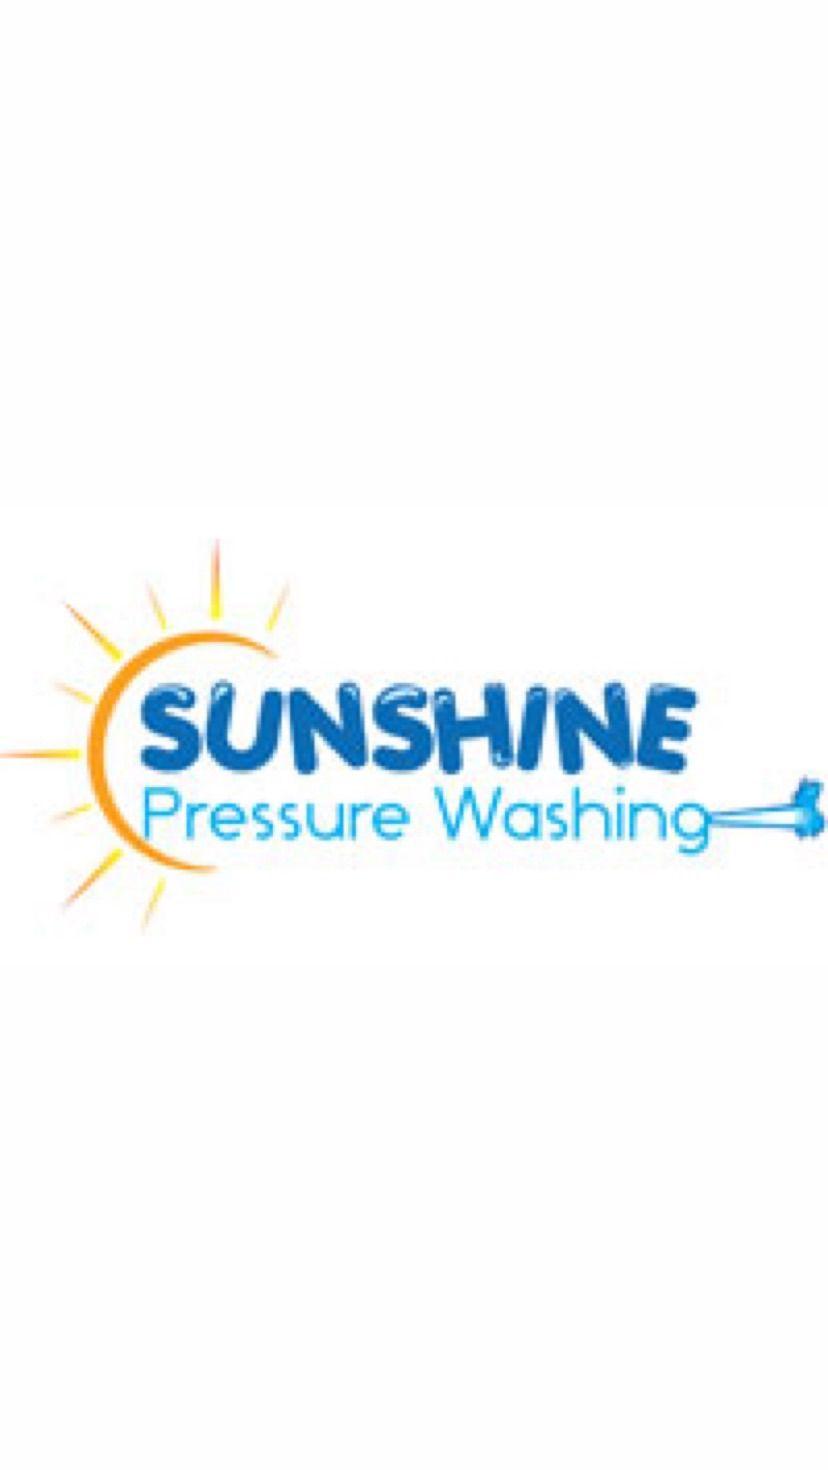 Sunshine Pressure Washing